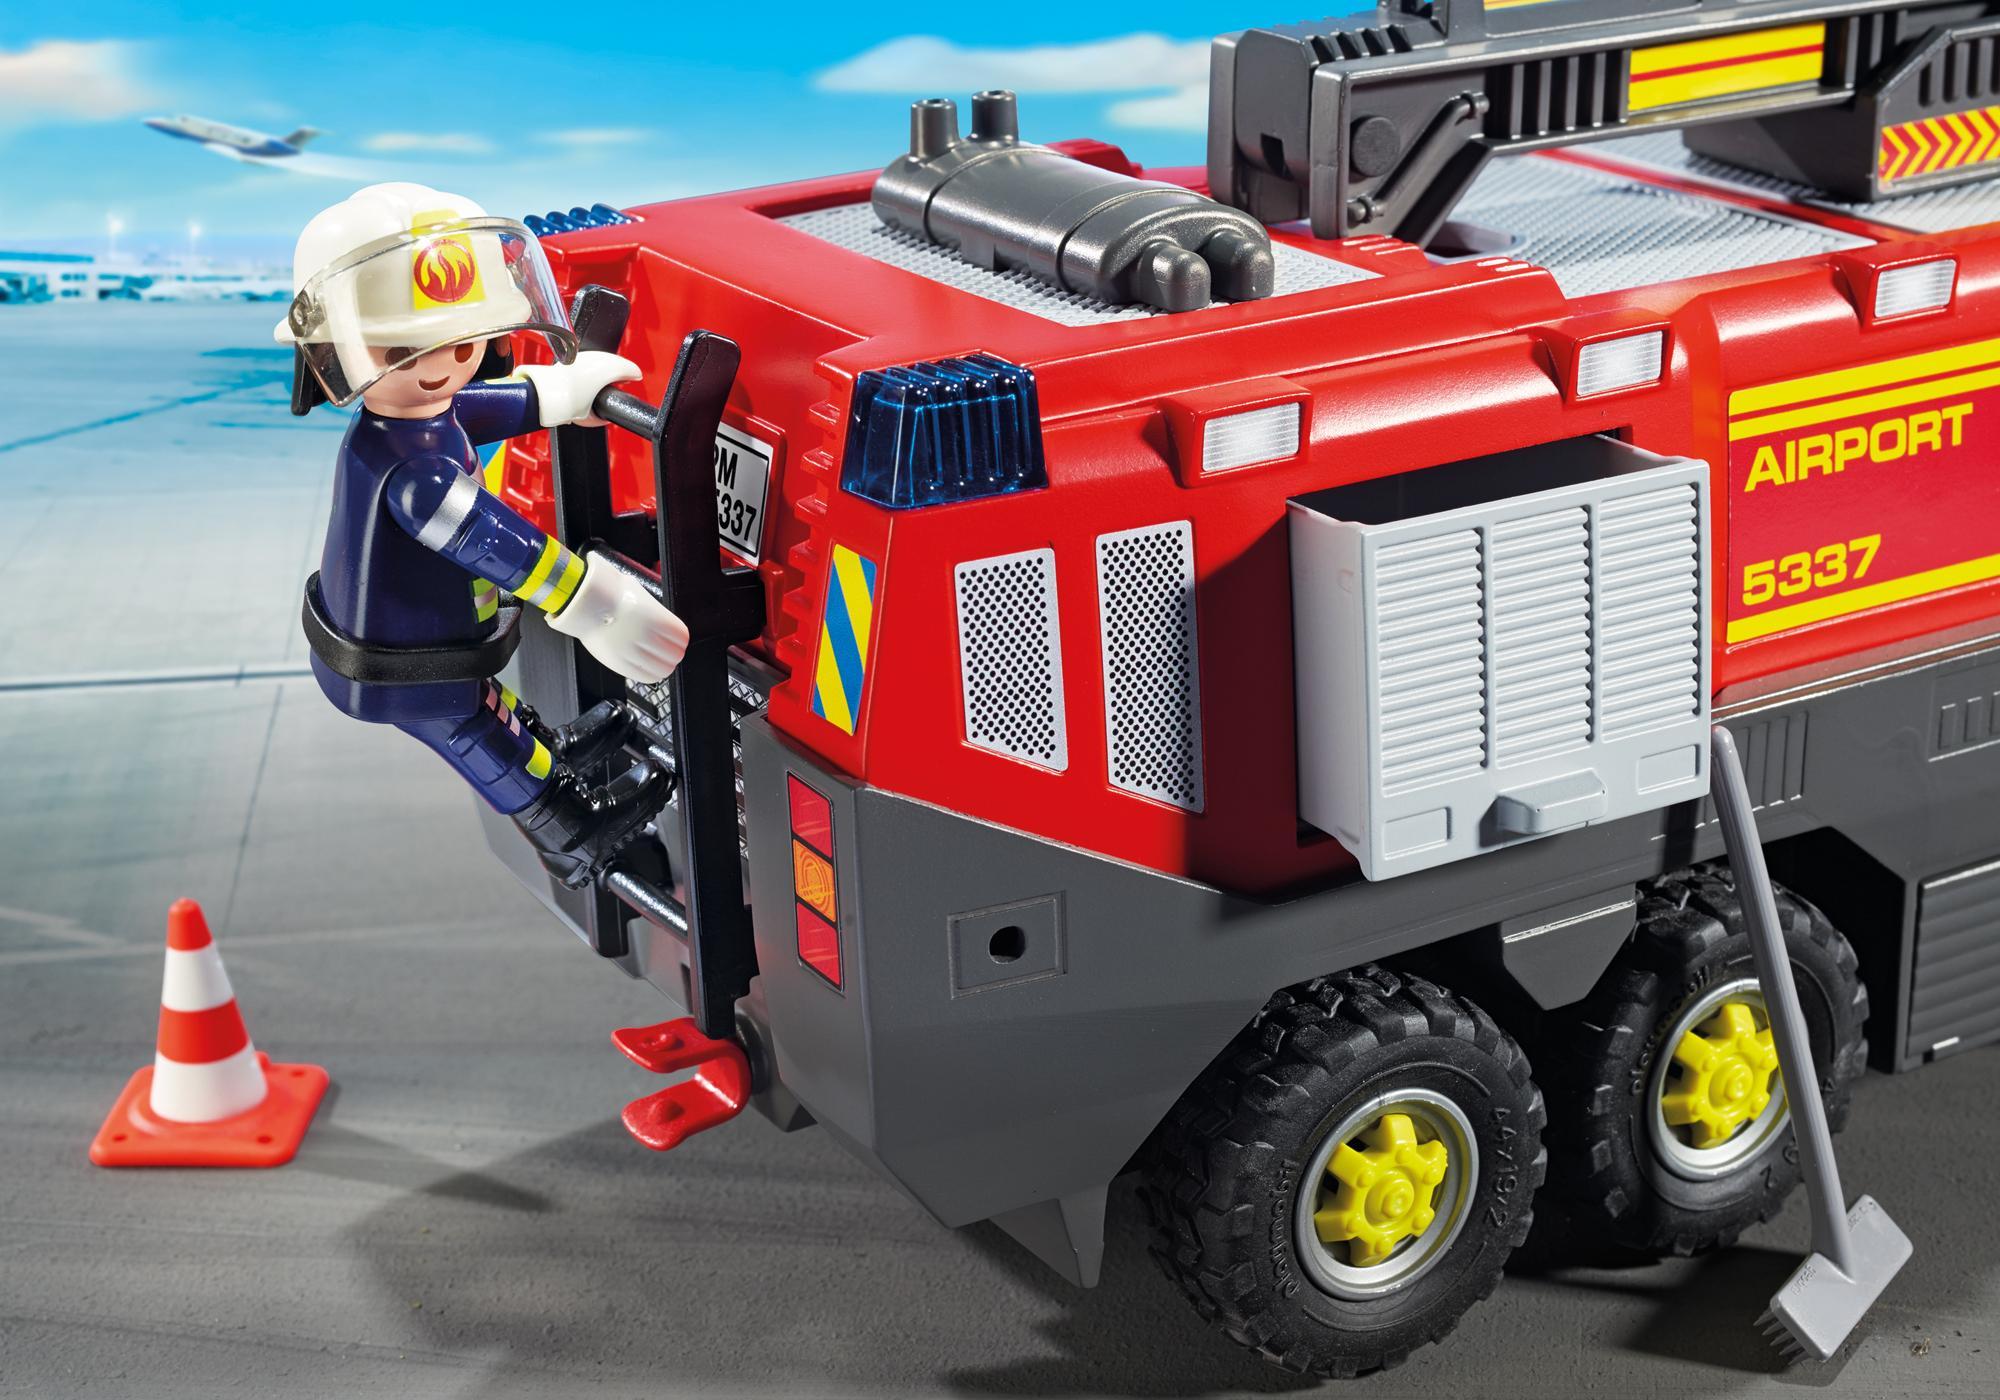 http://media.playmobil.com/i/playmobil/5337_product_extra2/Mezzo antincendio dell'aeroporto